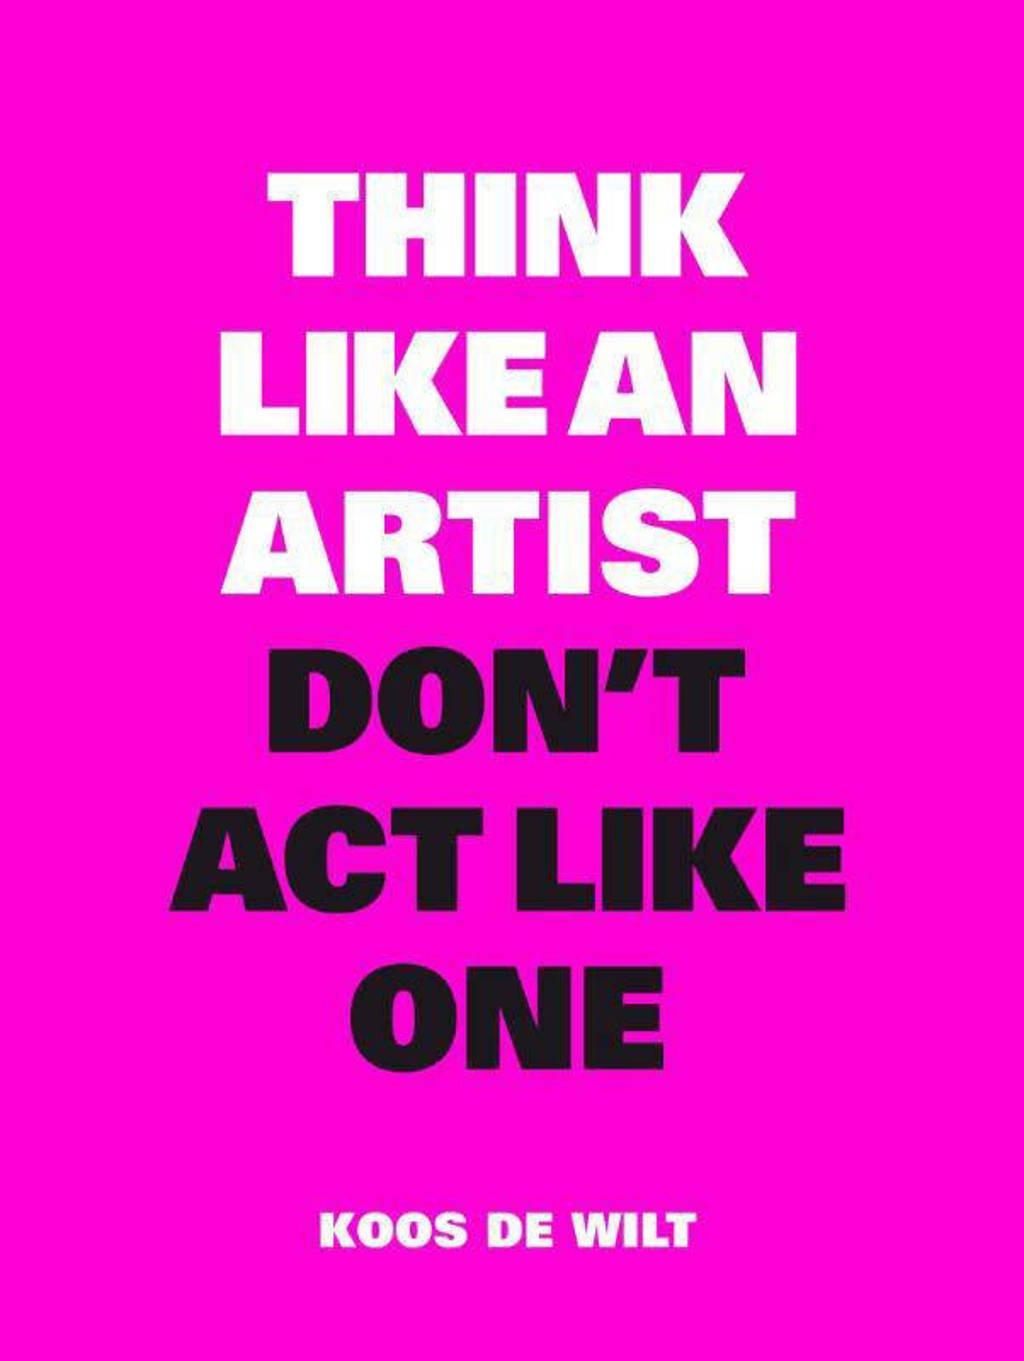 Think like an artist, don't act like one - Koos de Wilt